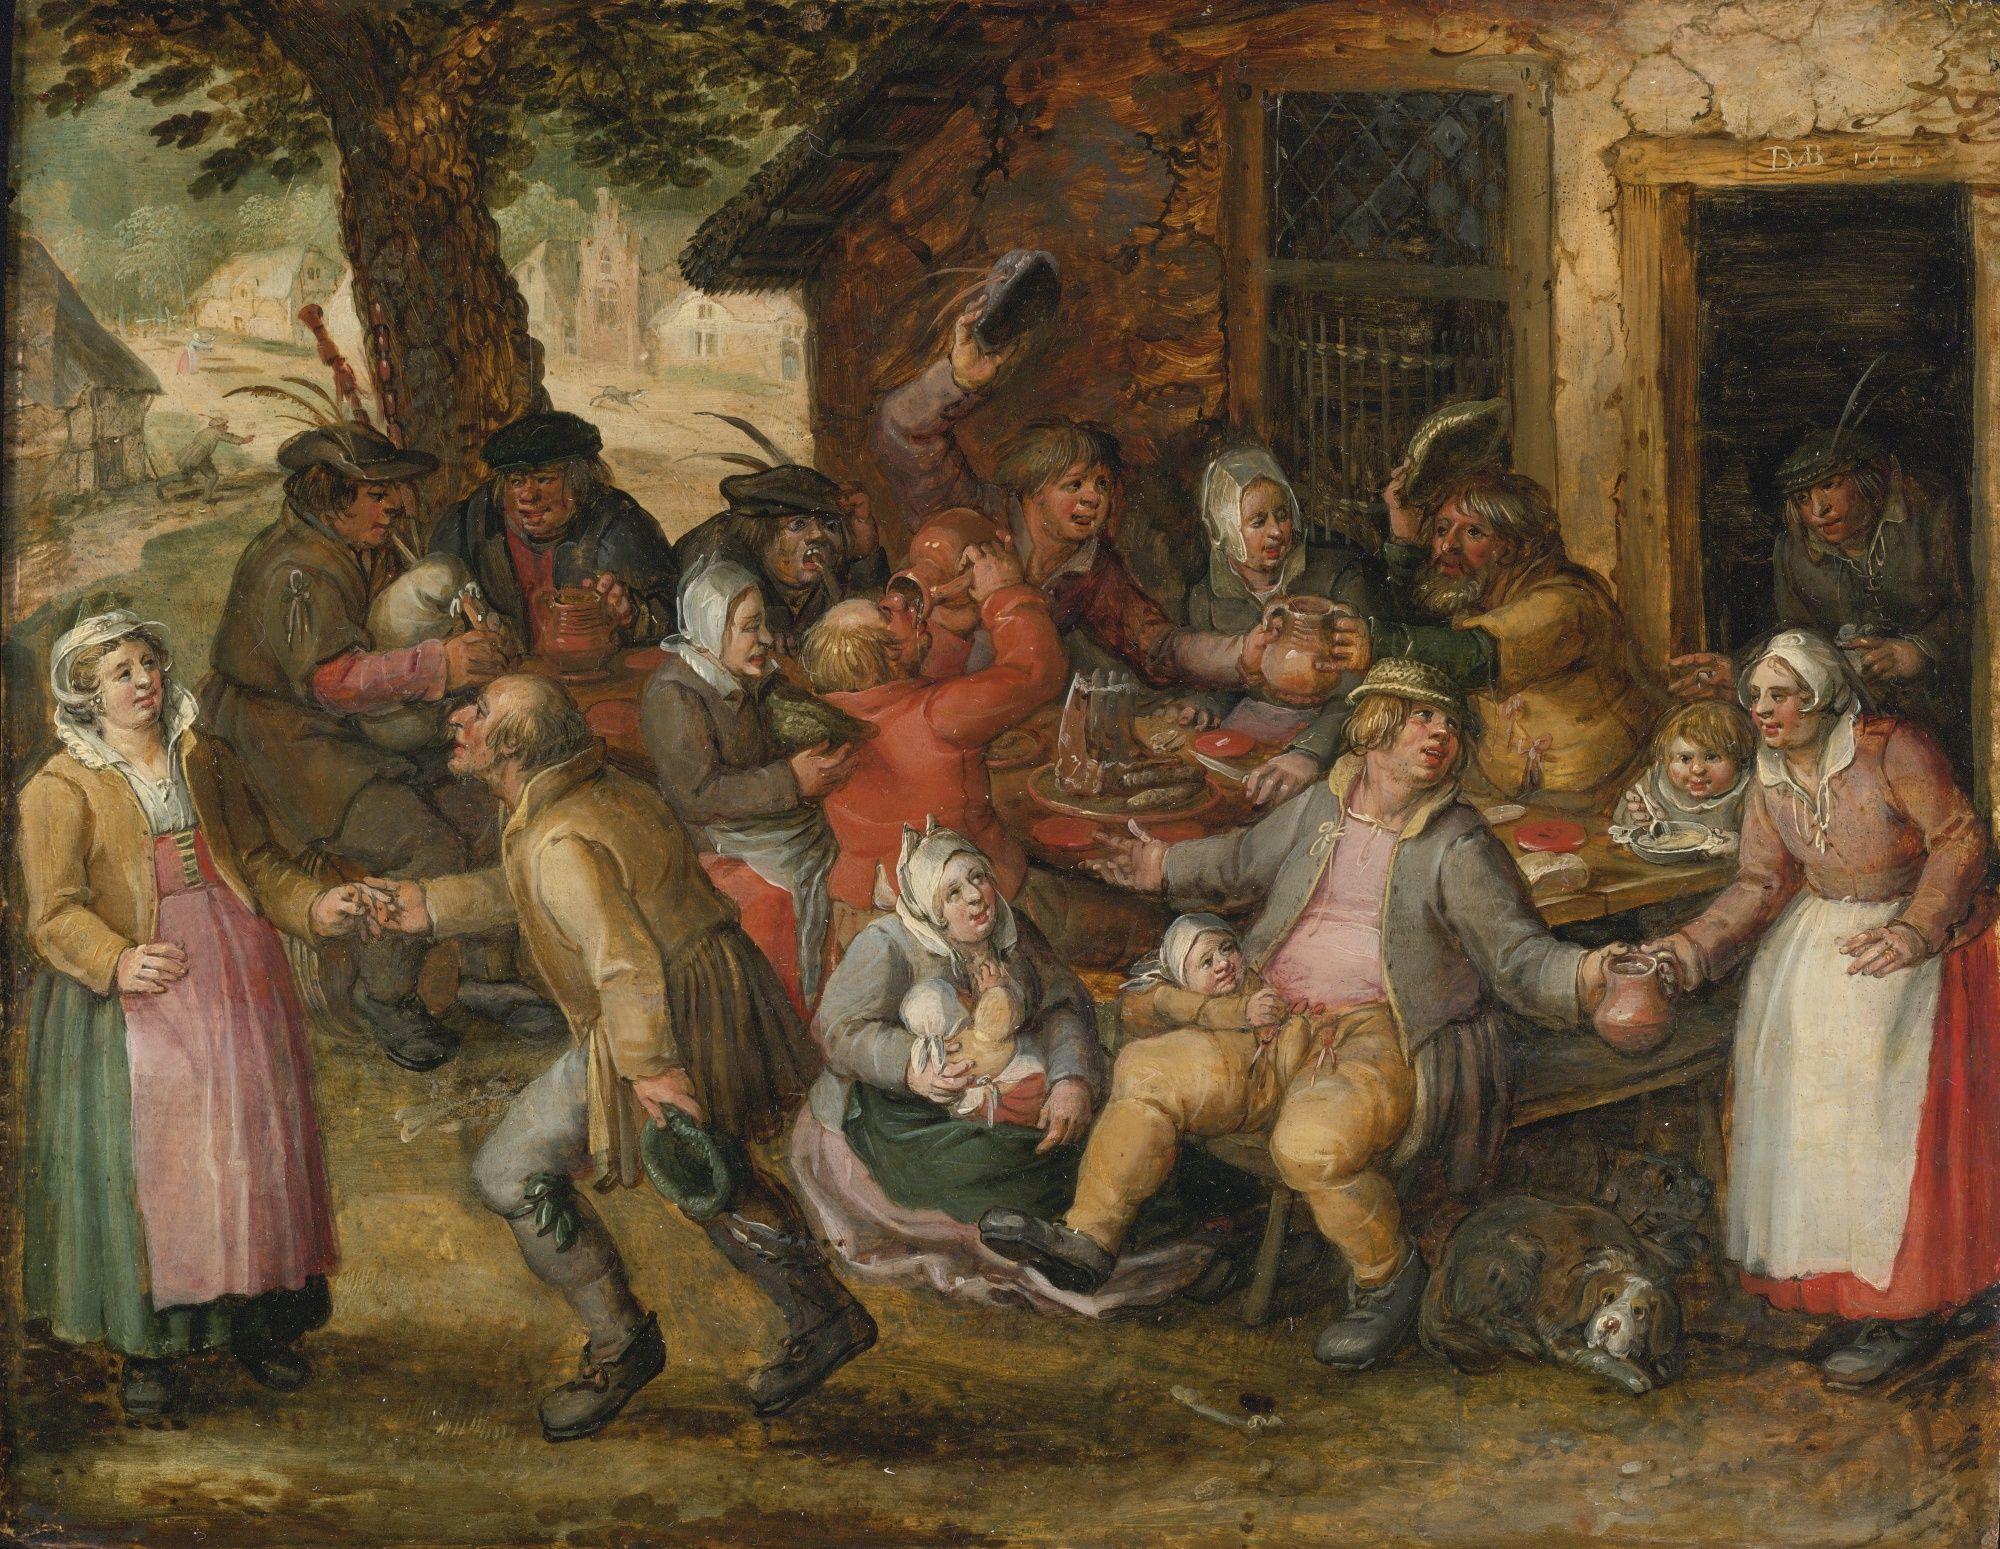 David vinckboons mechelen 1576 circa 1632 33 amsterdam for Art 1576 cc